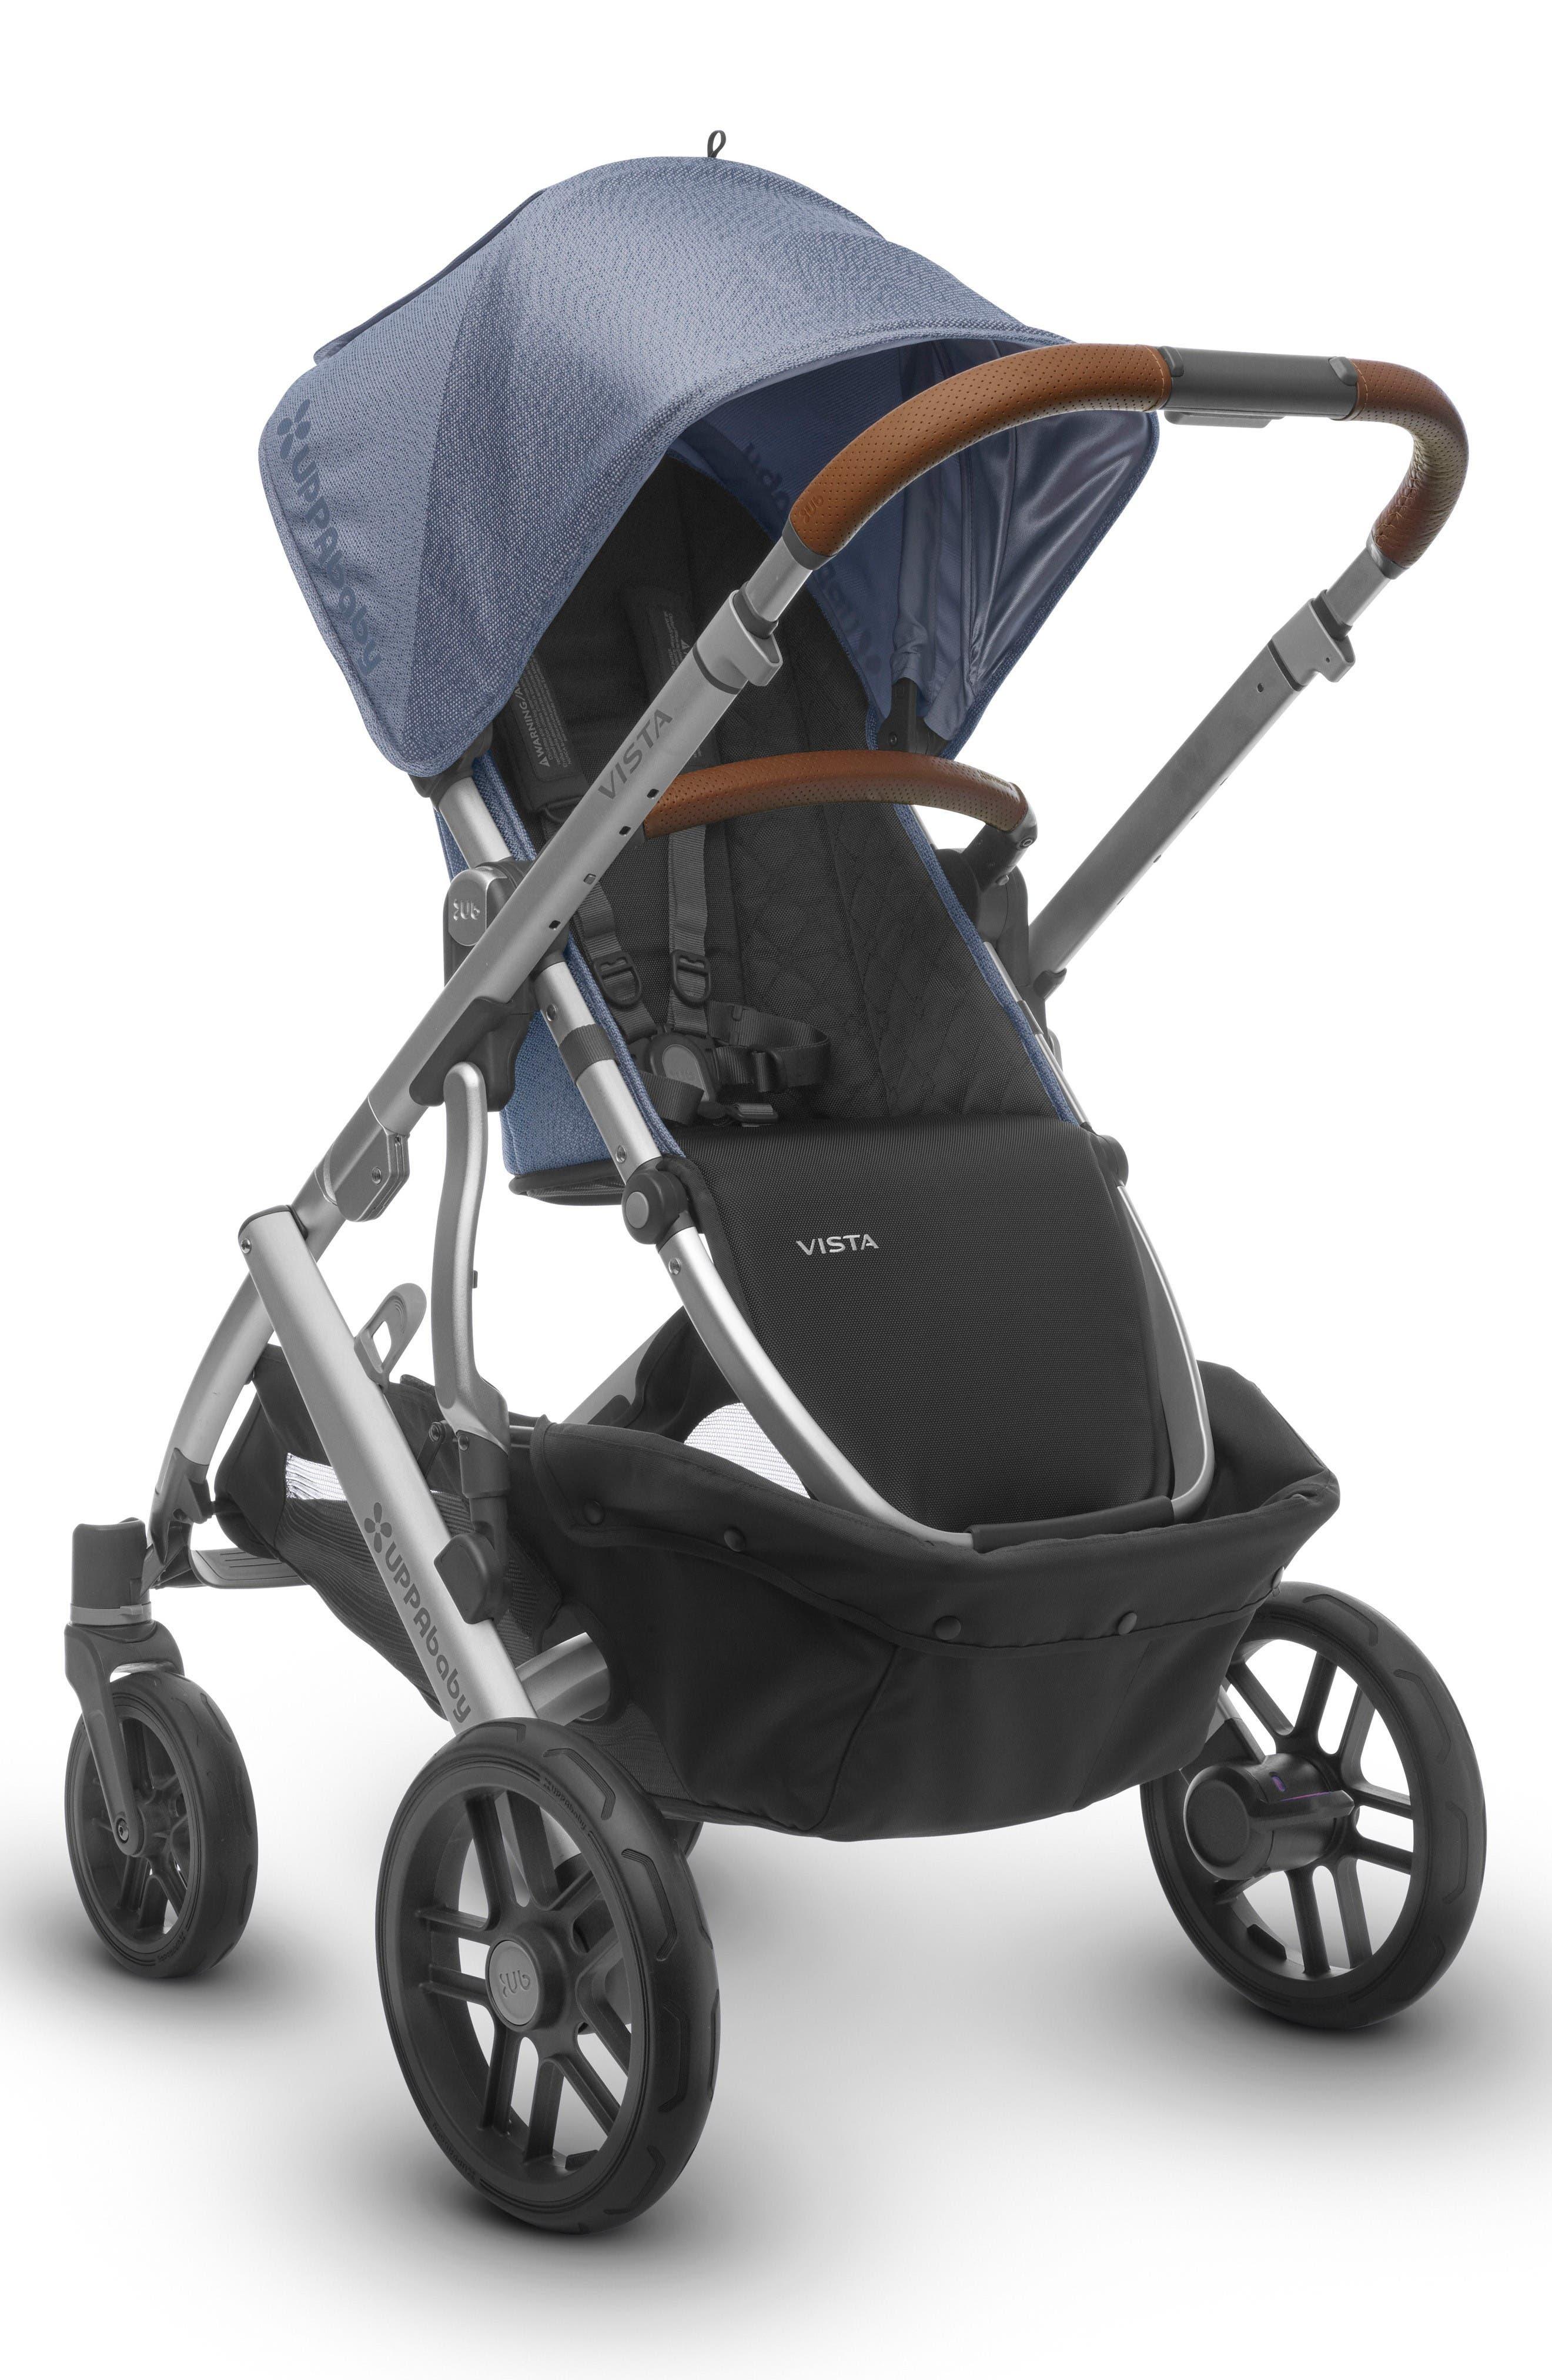 2017 VISTA Henry Aluminum Frame Convertible Stroller with Bassinet & Toddler Seat,                             Alternate thumbnail 5, color,                             Blue Marl